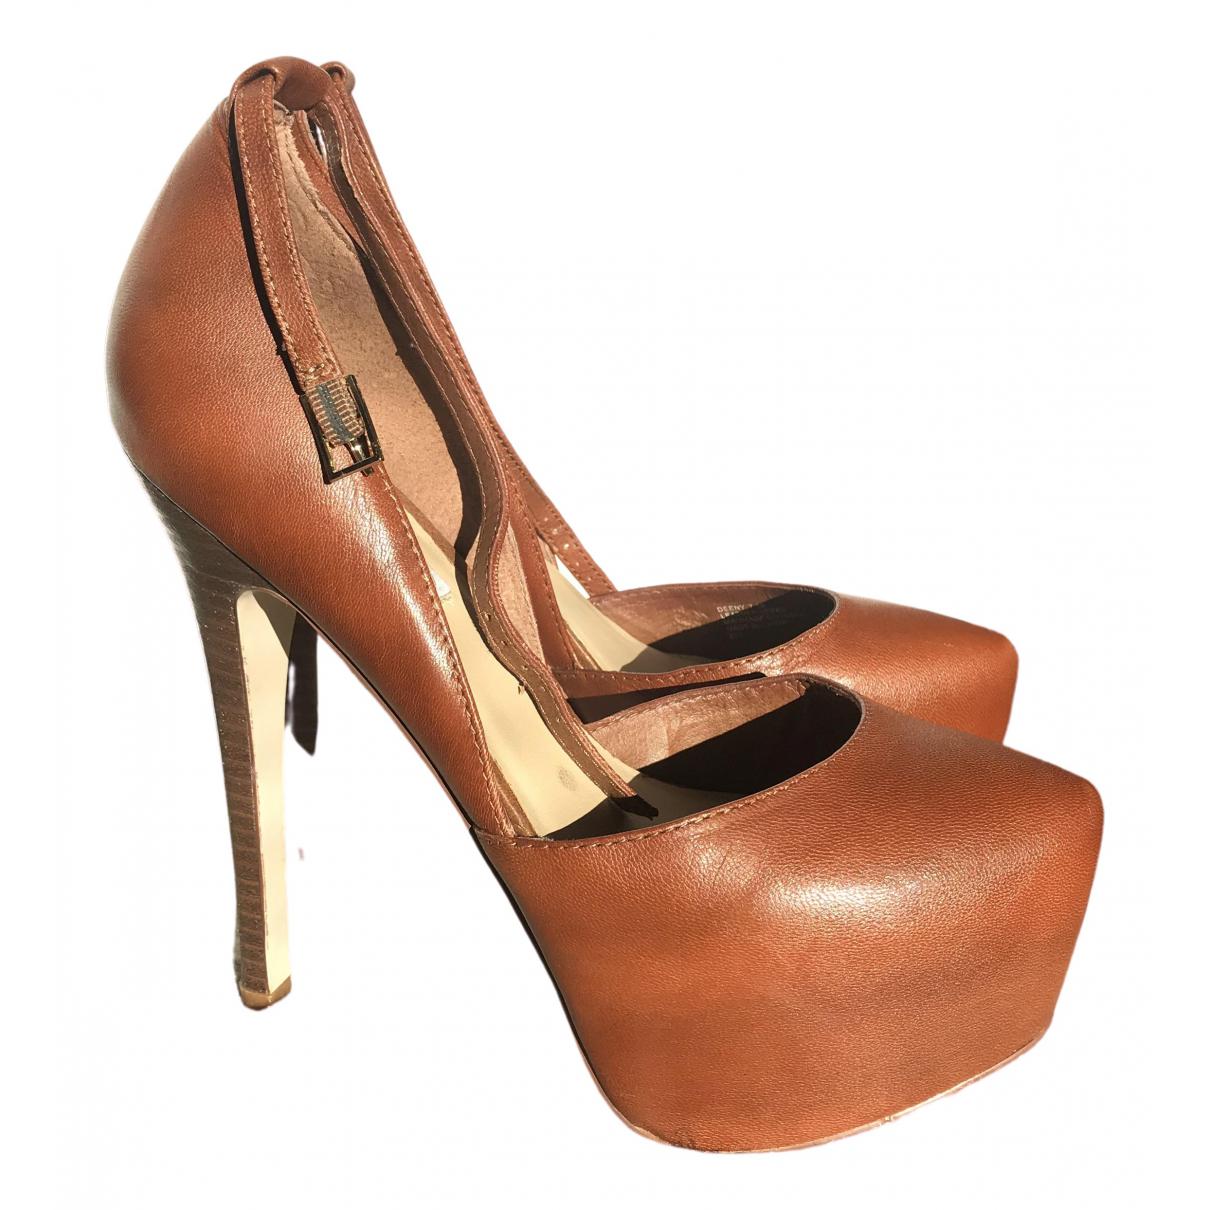 Steve Madden \N Brown Leather Heels for Women 38 EU